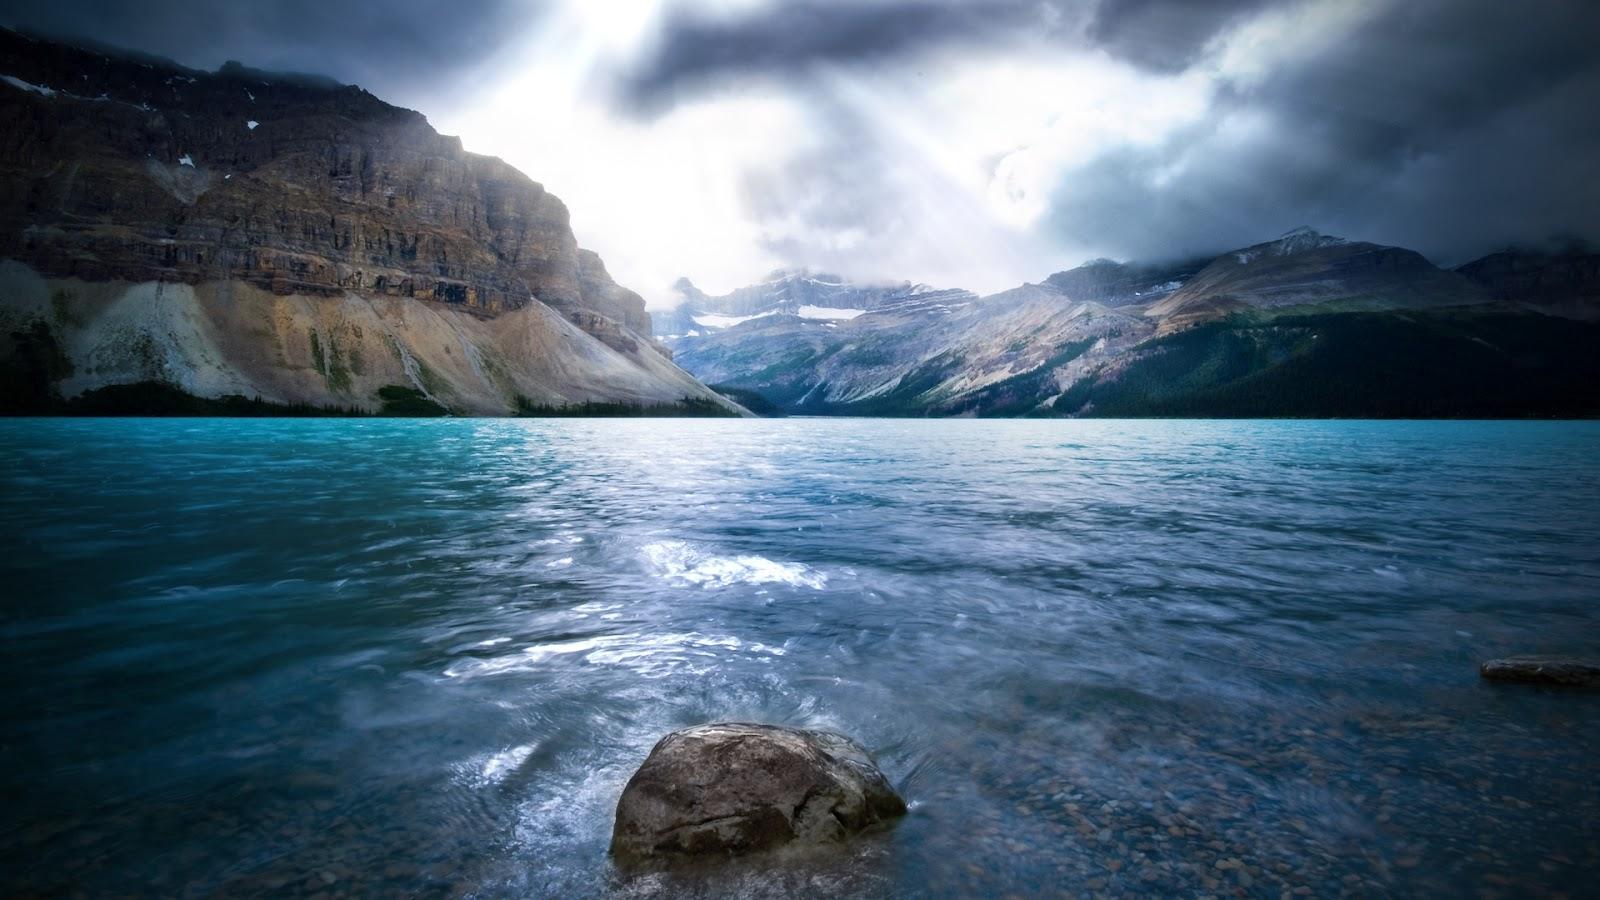 BEAUTIFUL LANDSCAPE HD WALLPAPER Top HD Wallpapers 1600x900